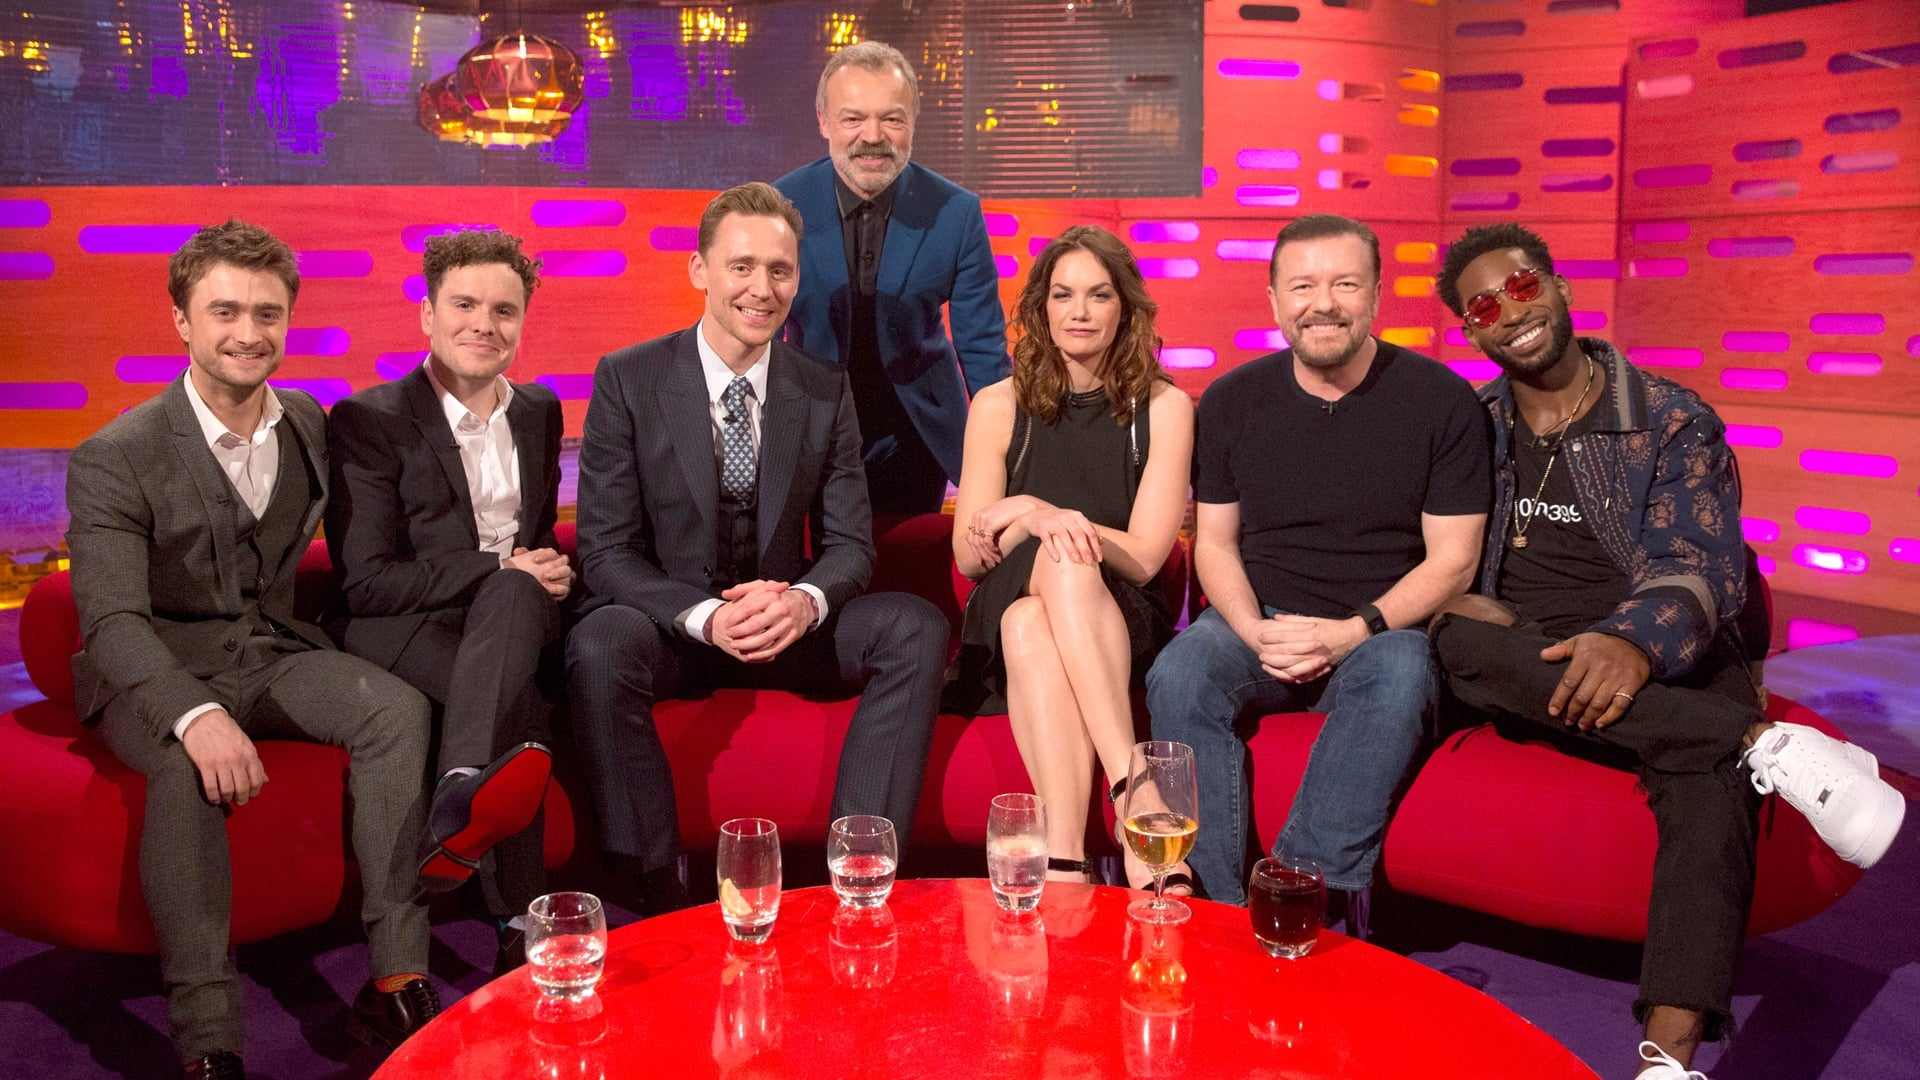 The Graham Norton Show Season 20 :Episode 18  Tom Hiddleston, Ruth Wilson, Ricky Gervais, Daniel Radcliffe, Joshua McGuire, Tinie Tempah